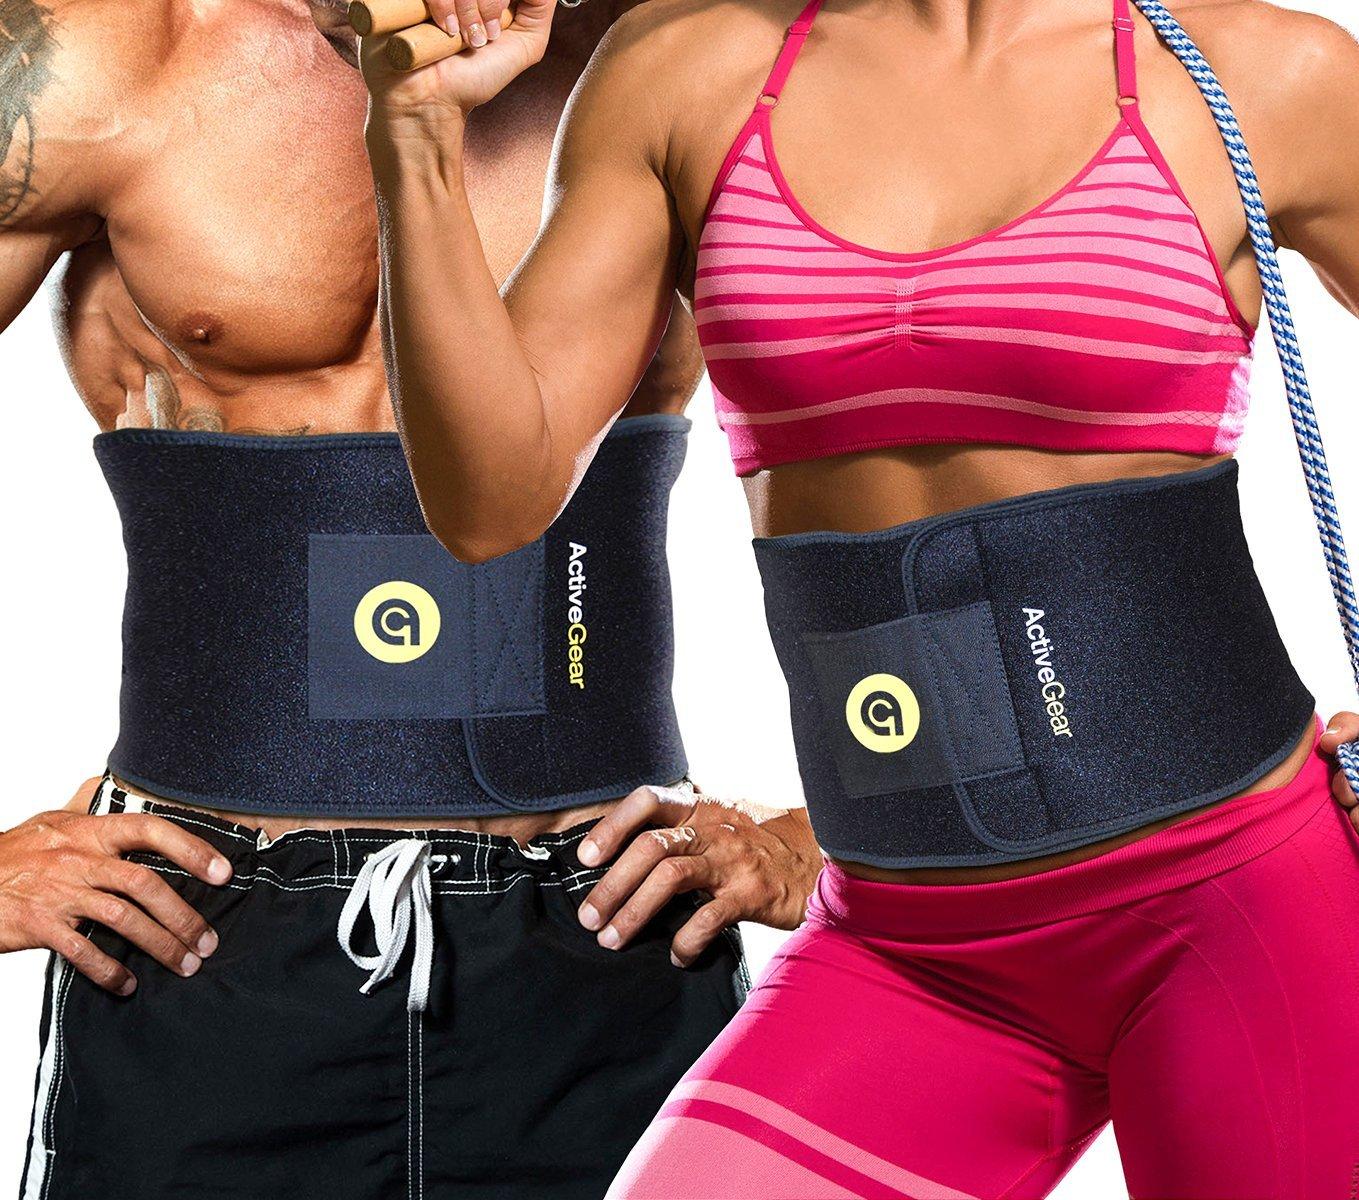 587fed6841 ActiveGear Premium Waist Trimmer Belt Slim Body Wrap. CHECKOUT ON AMAZON